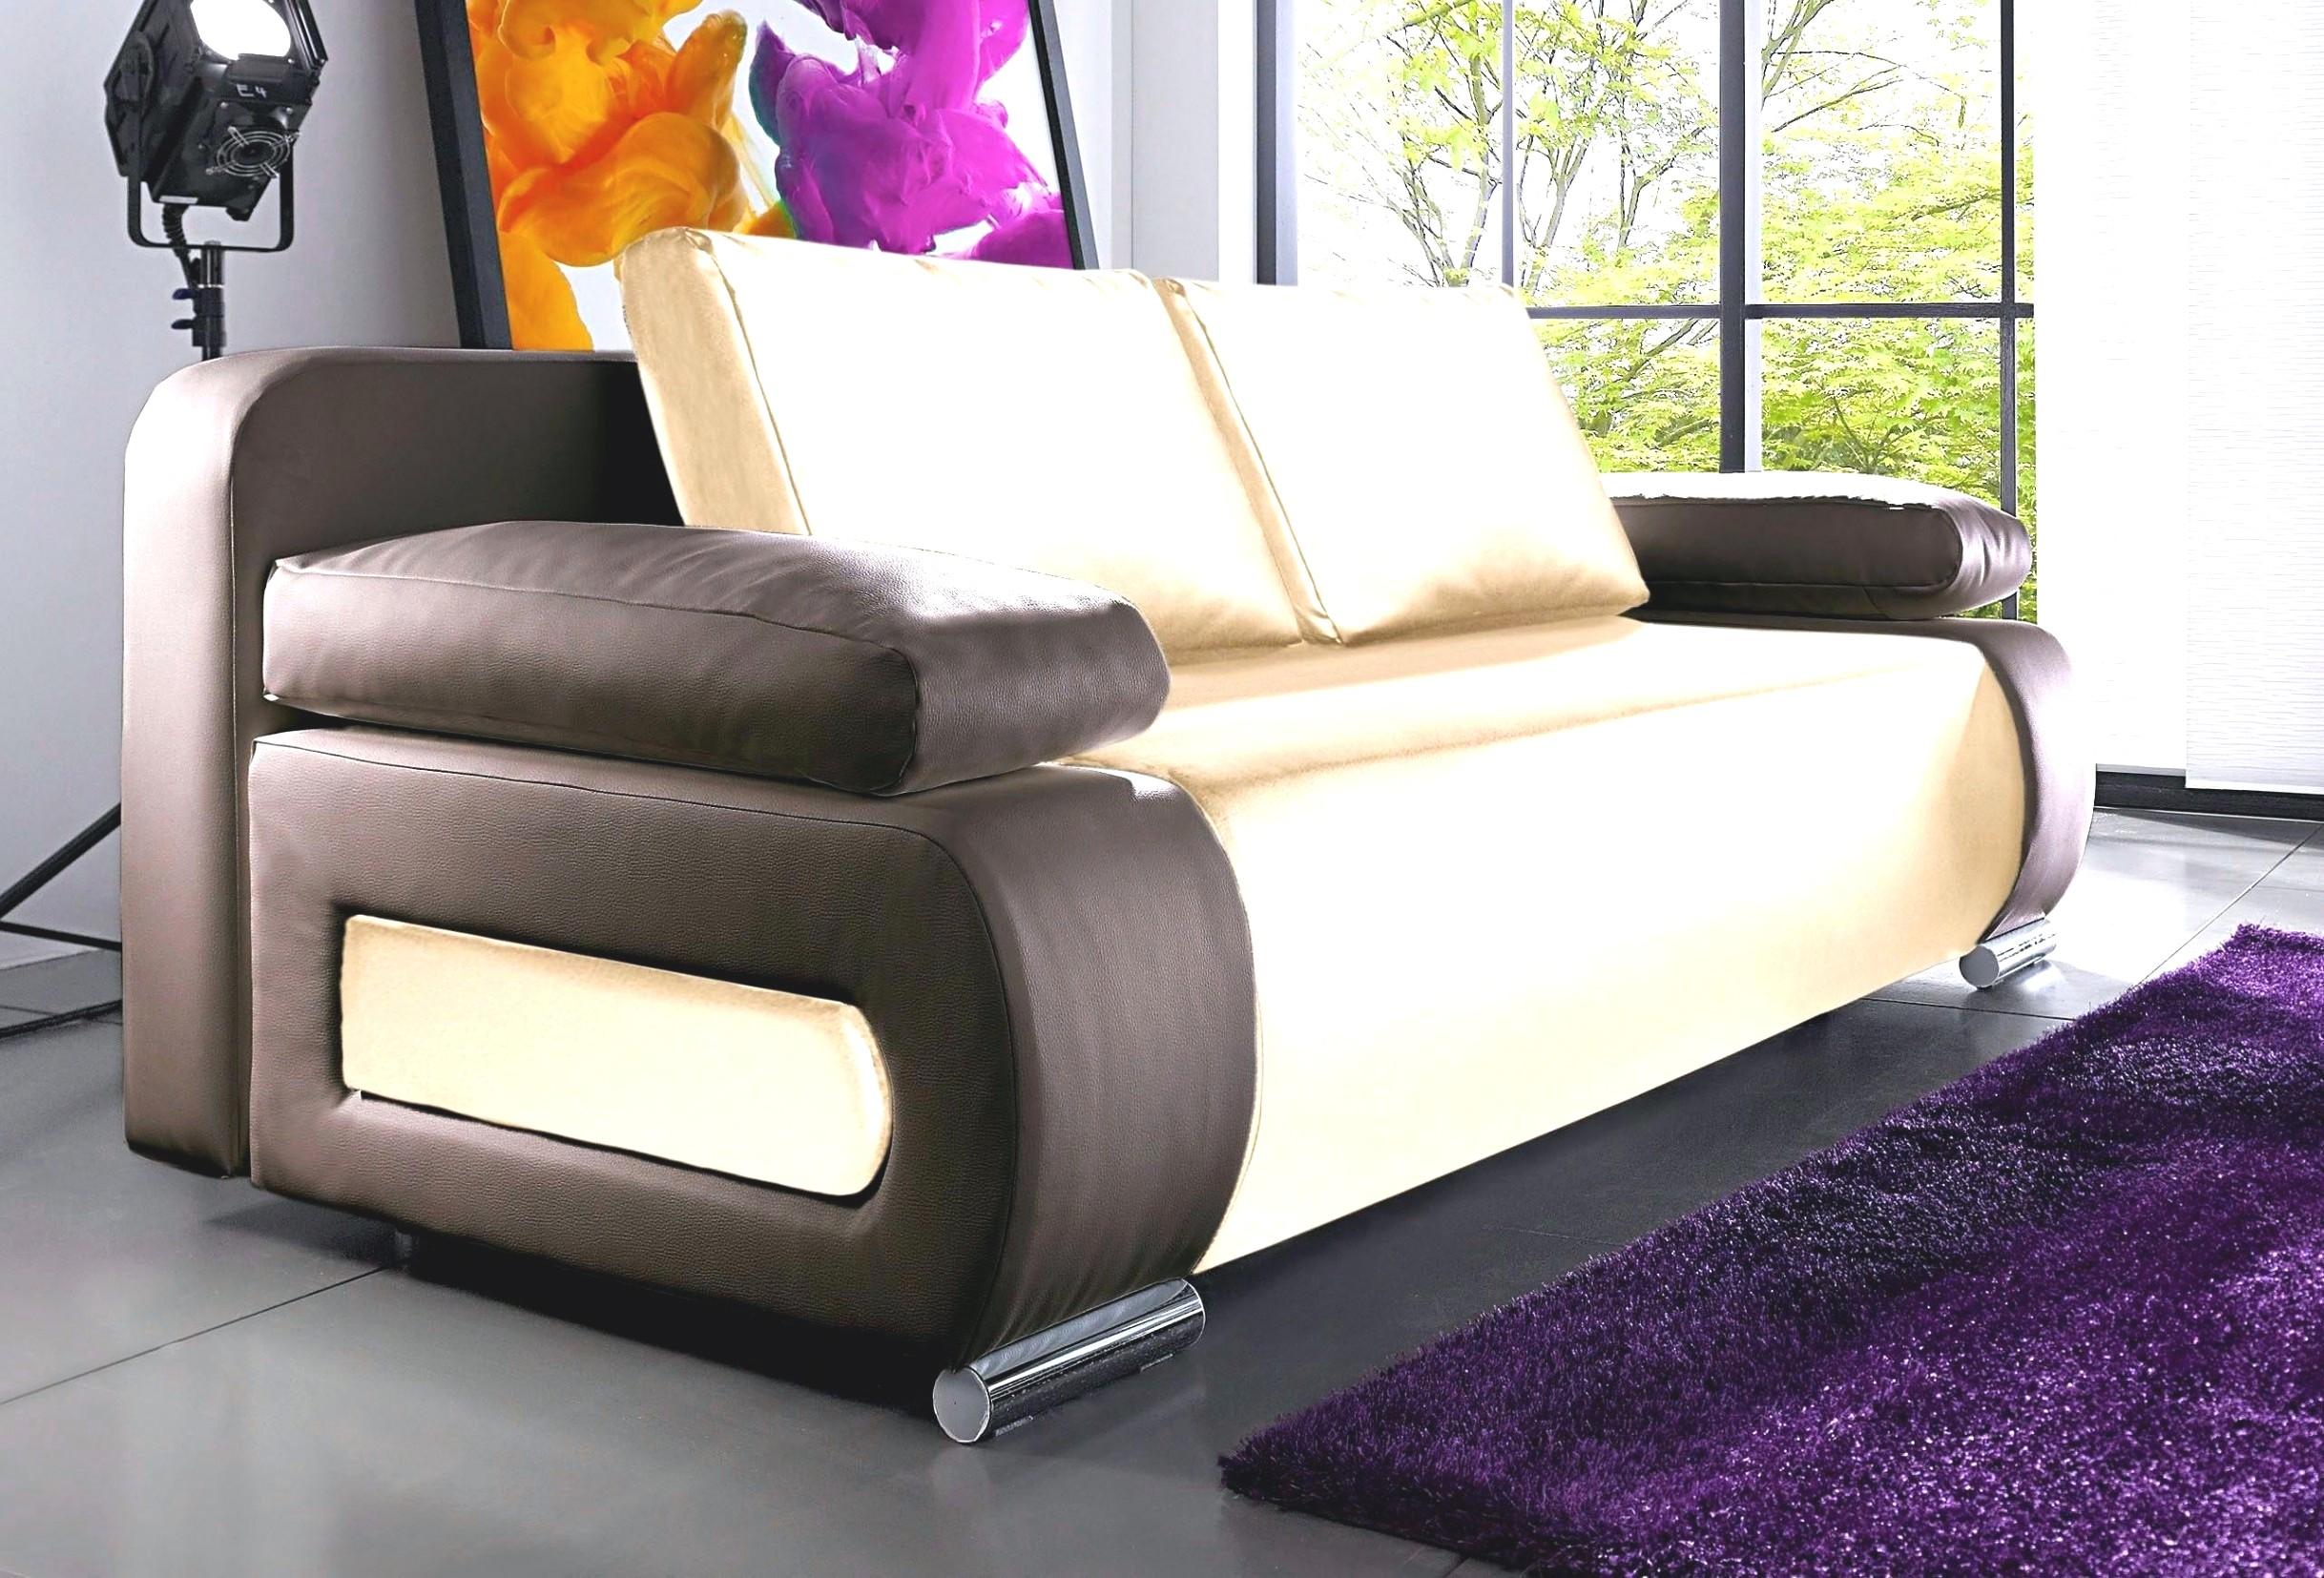 xxl lutz sofa badmobel interesting big with couch wahrend recamiere